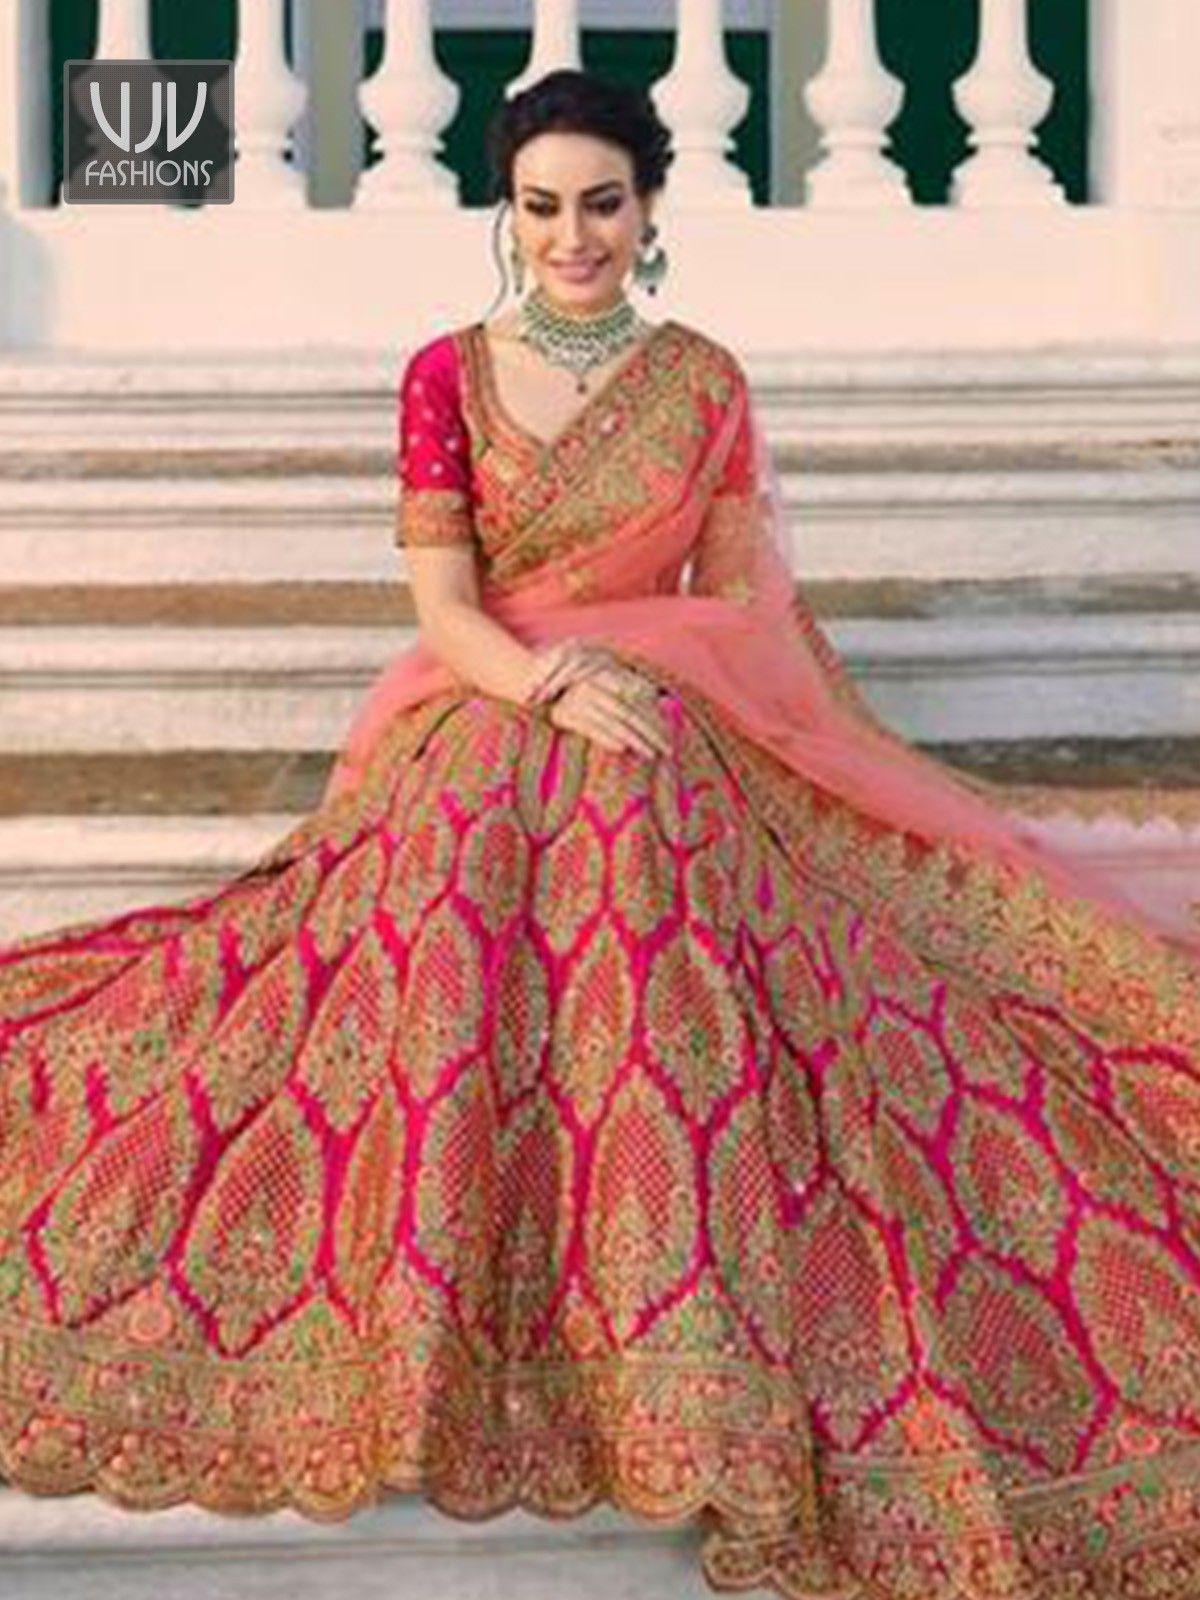 41e2cc93b66cc7 Surbhi Jyoti Pink Color Embroidered Lehenga Choli in 2019   Elbise ...